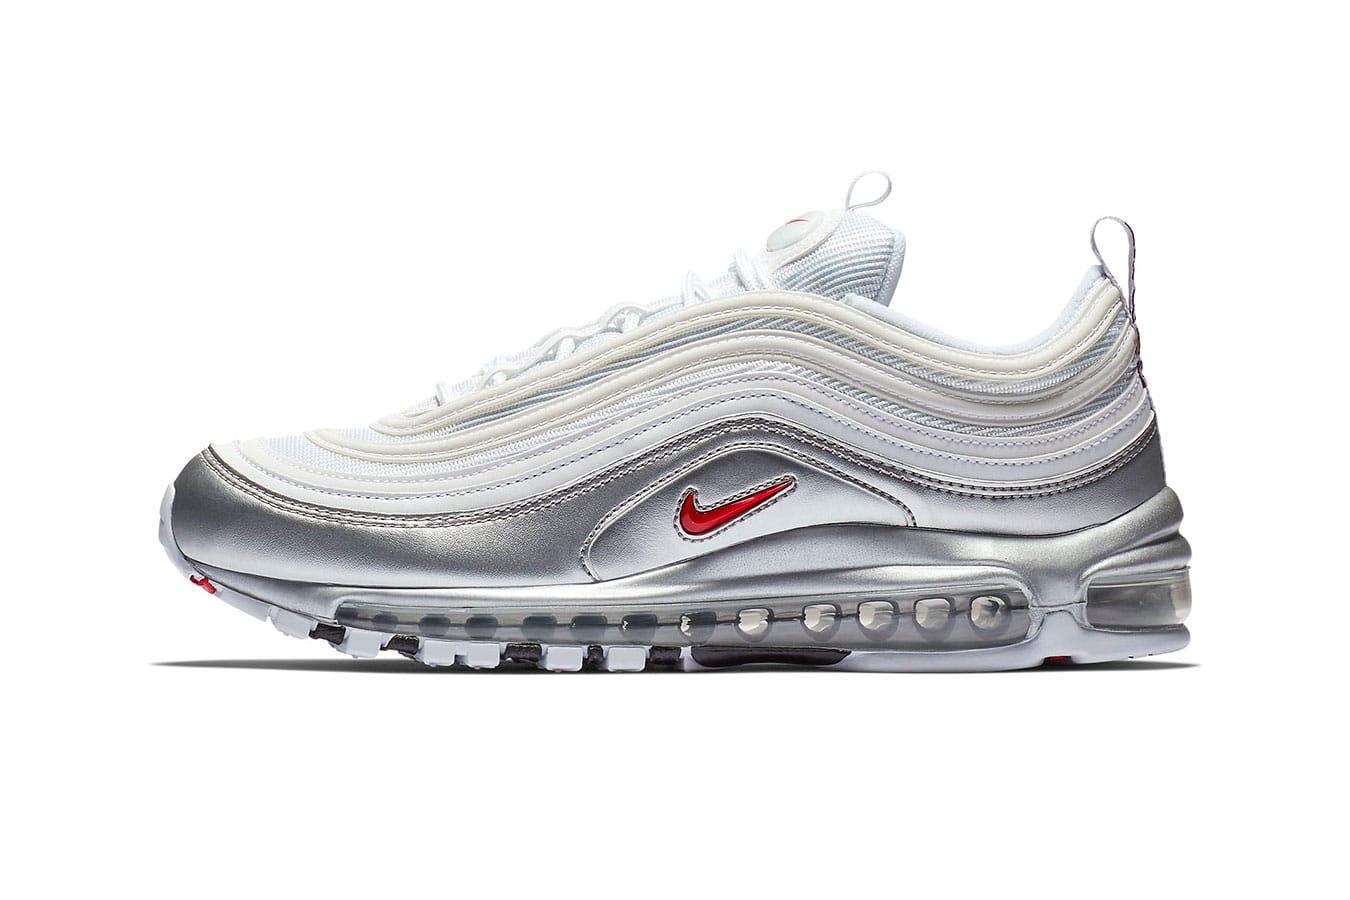 d38217ce728f Newest Air Max 97 Nike Free Run 3 Breath 5.0 Mens Size Chart